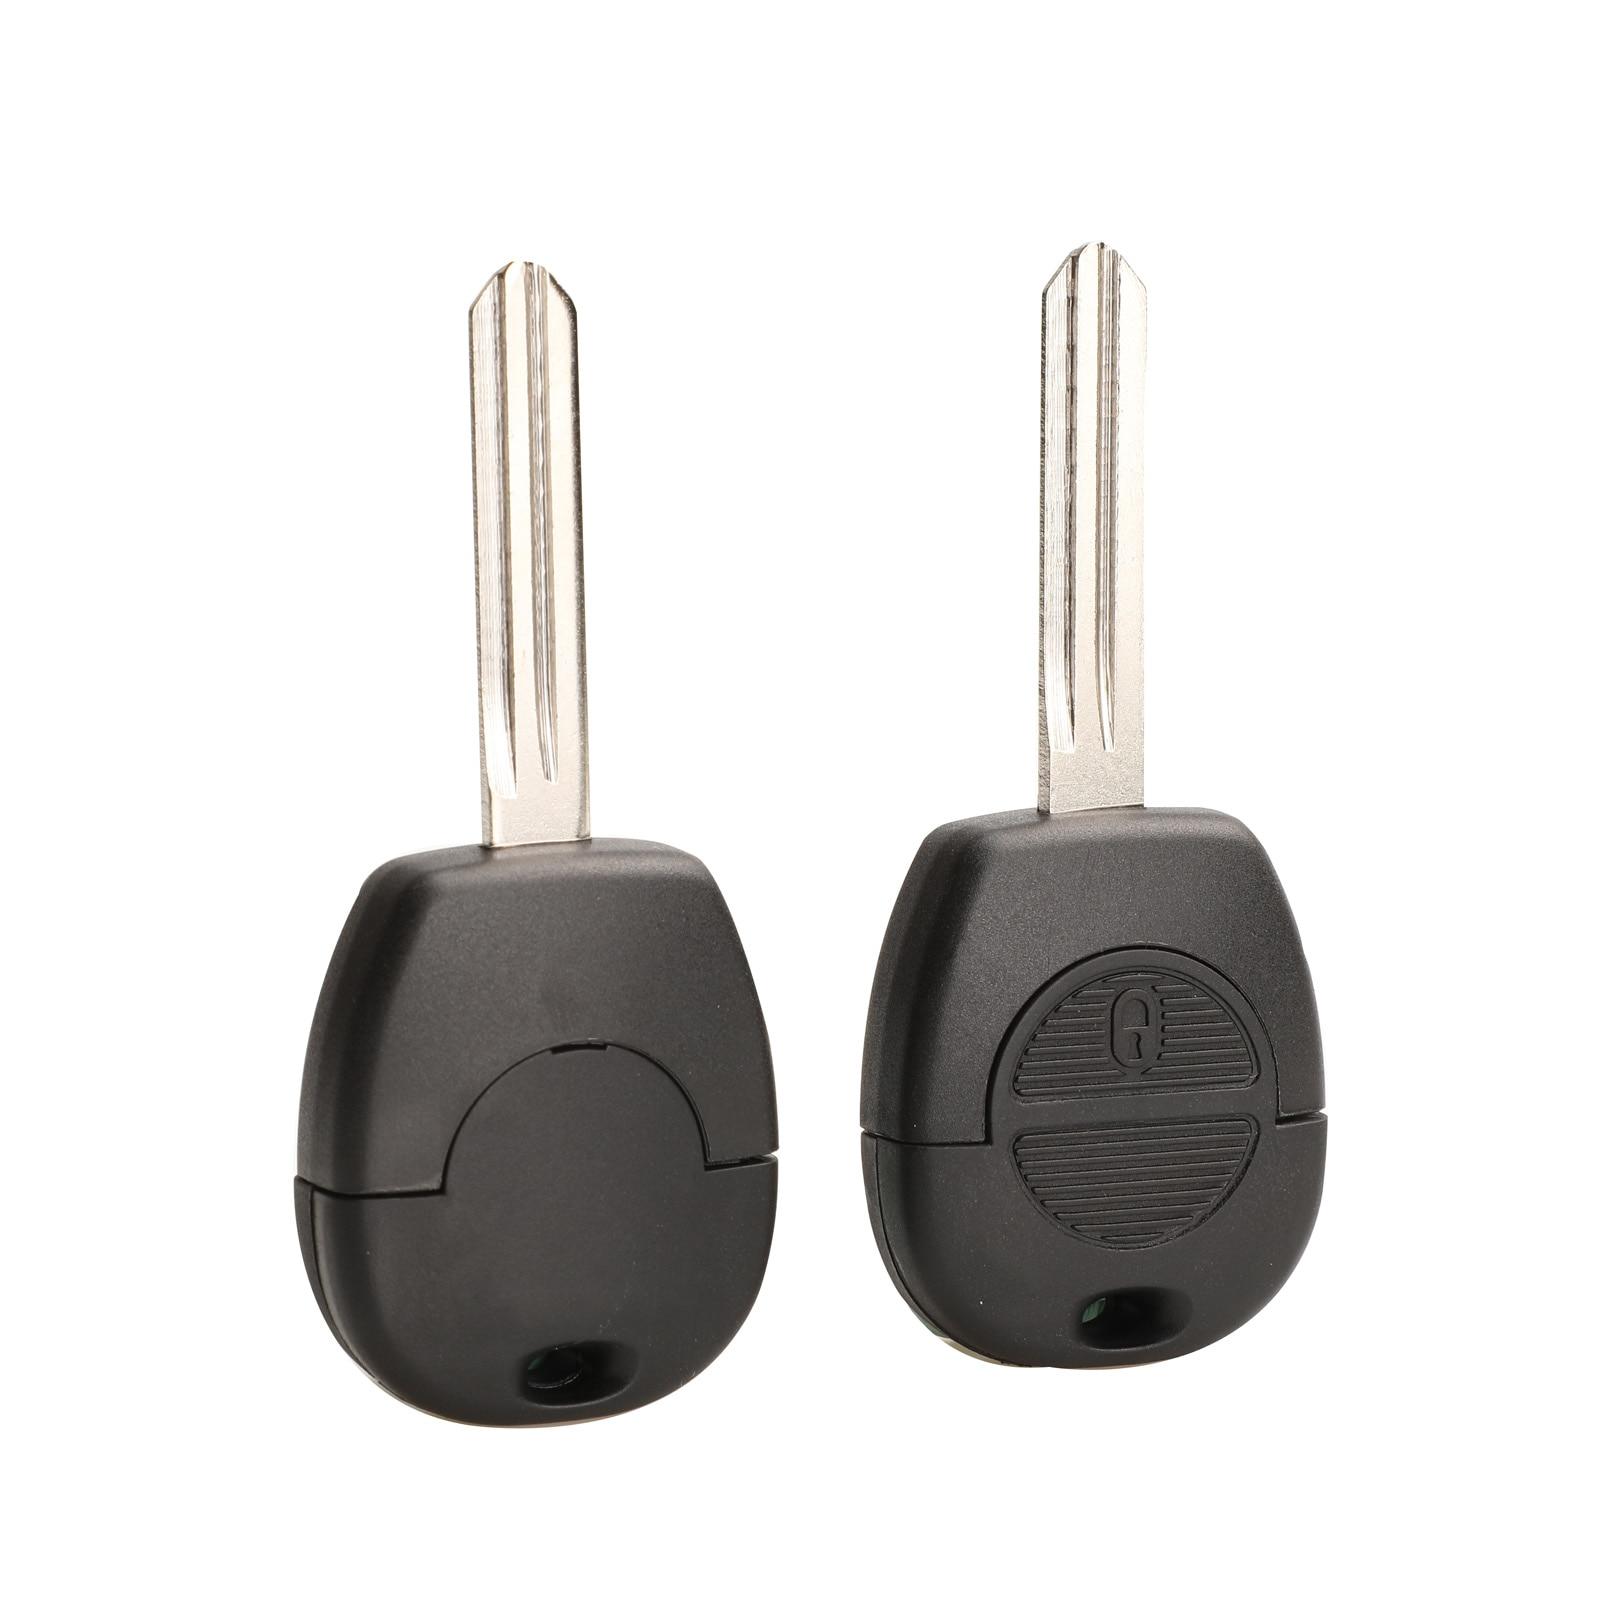 2 Button Remote Flip Fob Car Key Shell for Nissan Micra Almera Primera X-Trail Replacement Uncut Blade Car Key Case Cover